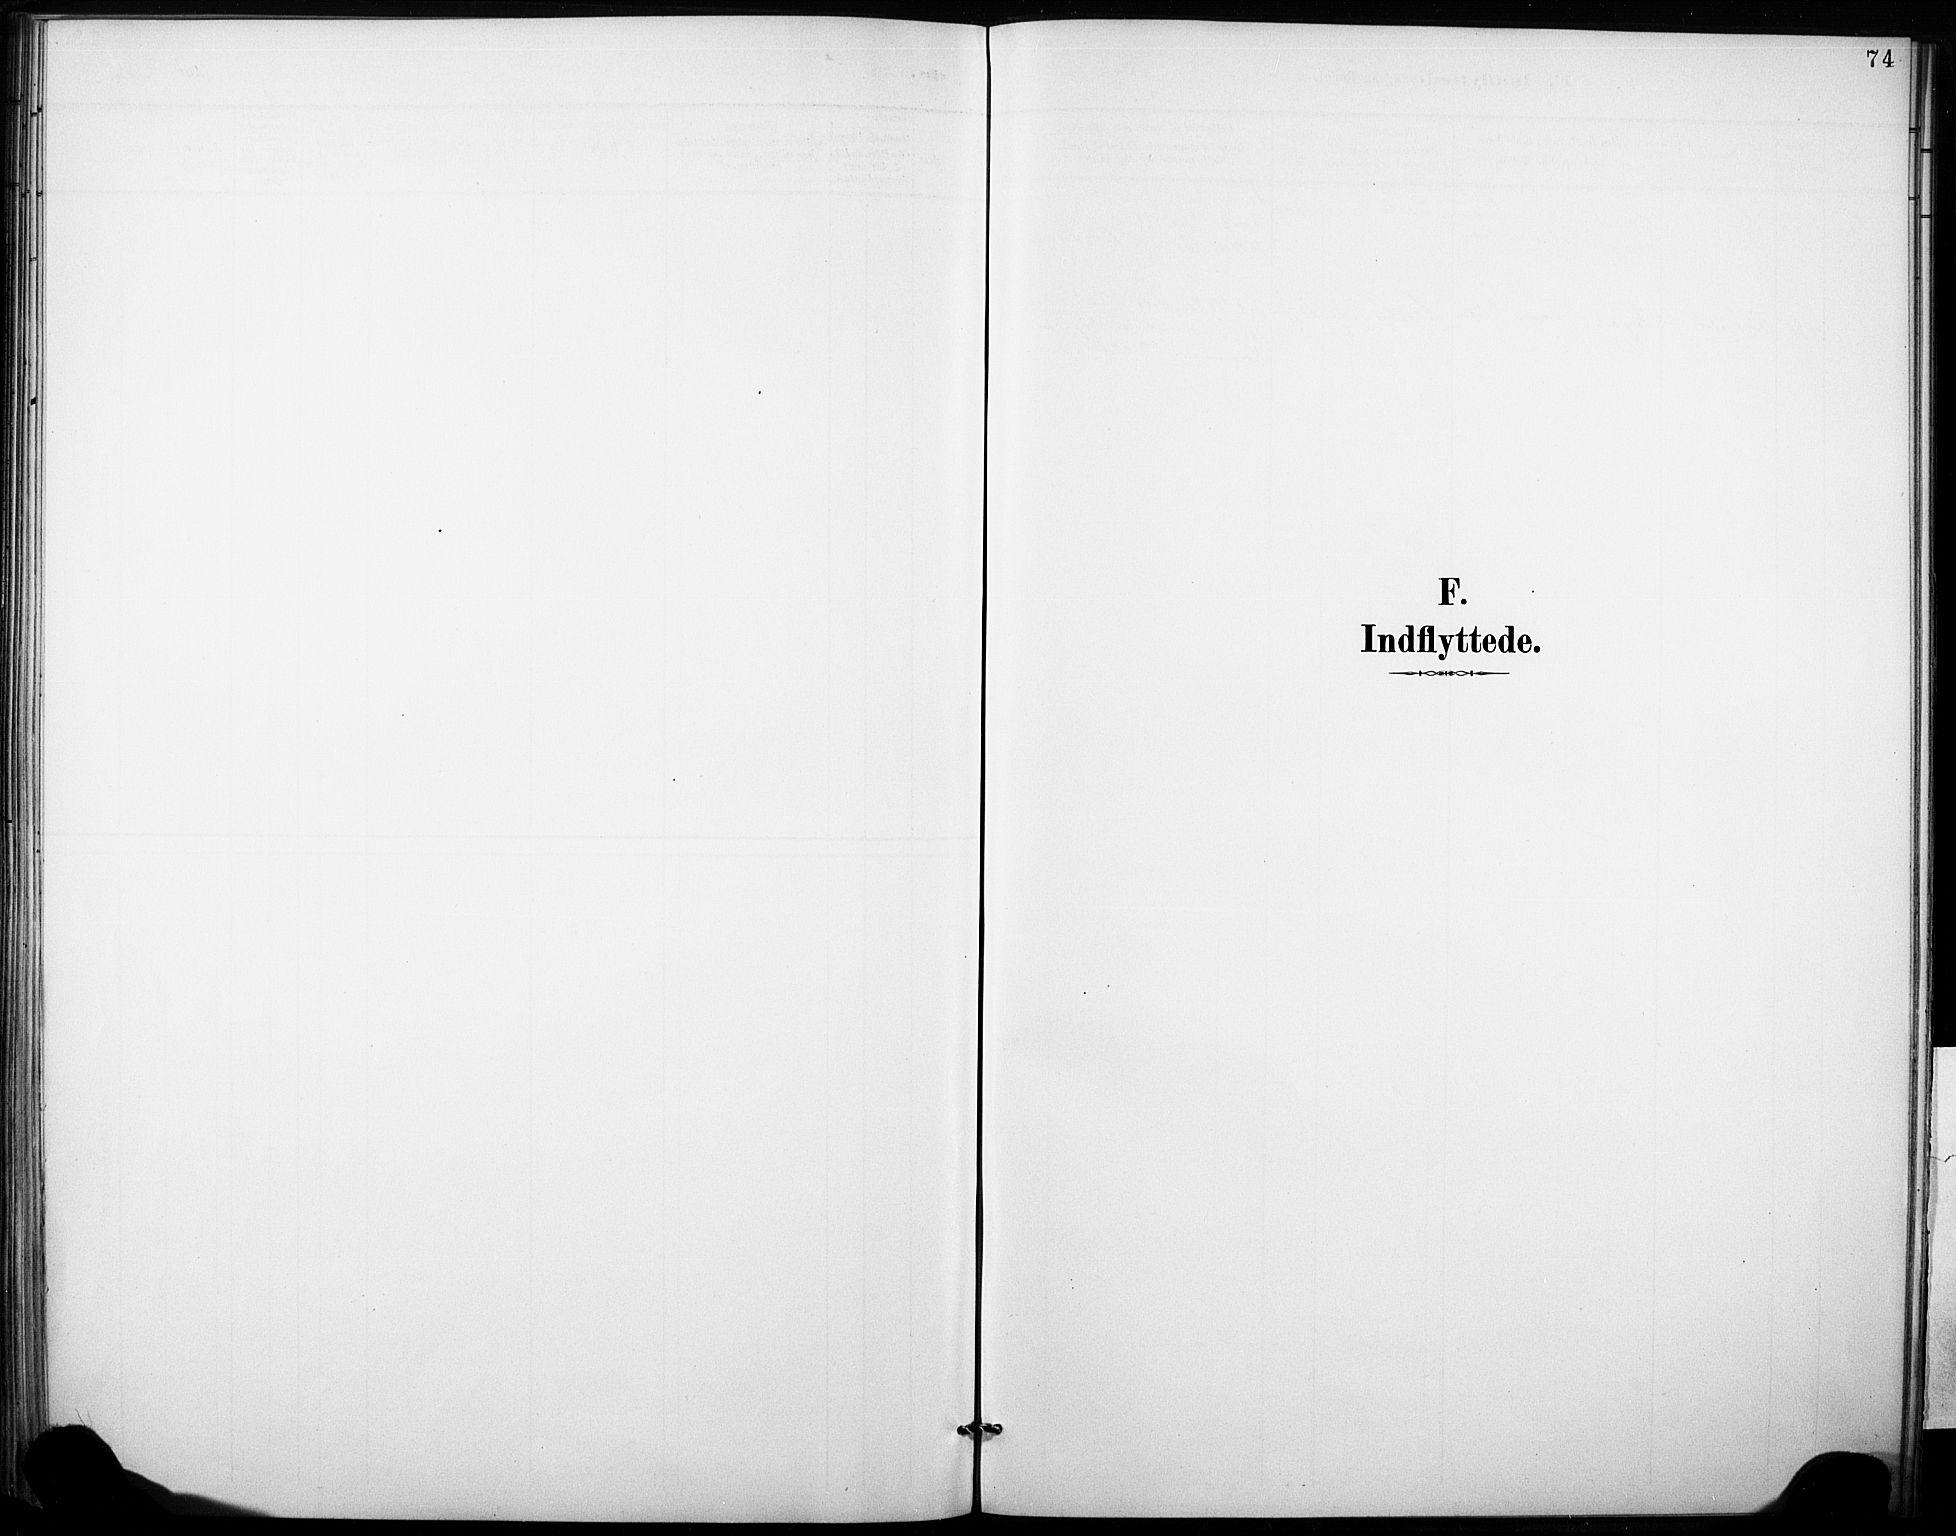 SAKO, Fyresdal kirkebøker, F/Fb/L0003: Ministerialbok nr. II 3, 1887-1903, s. 74